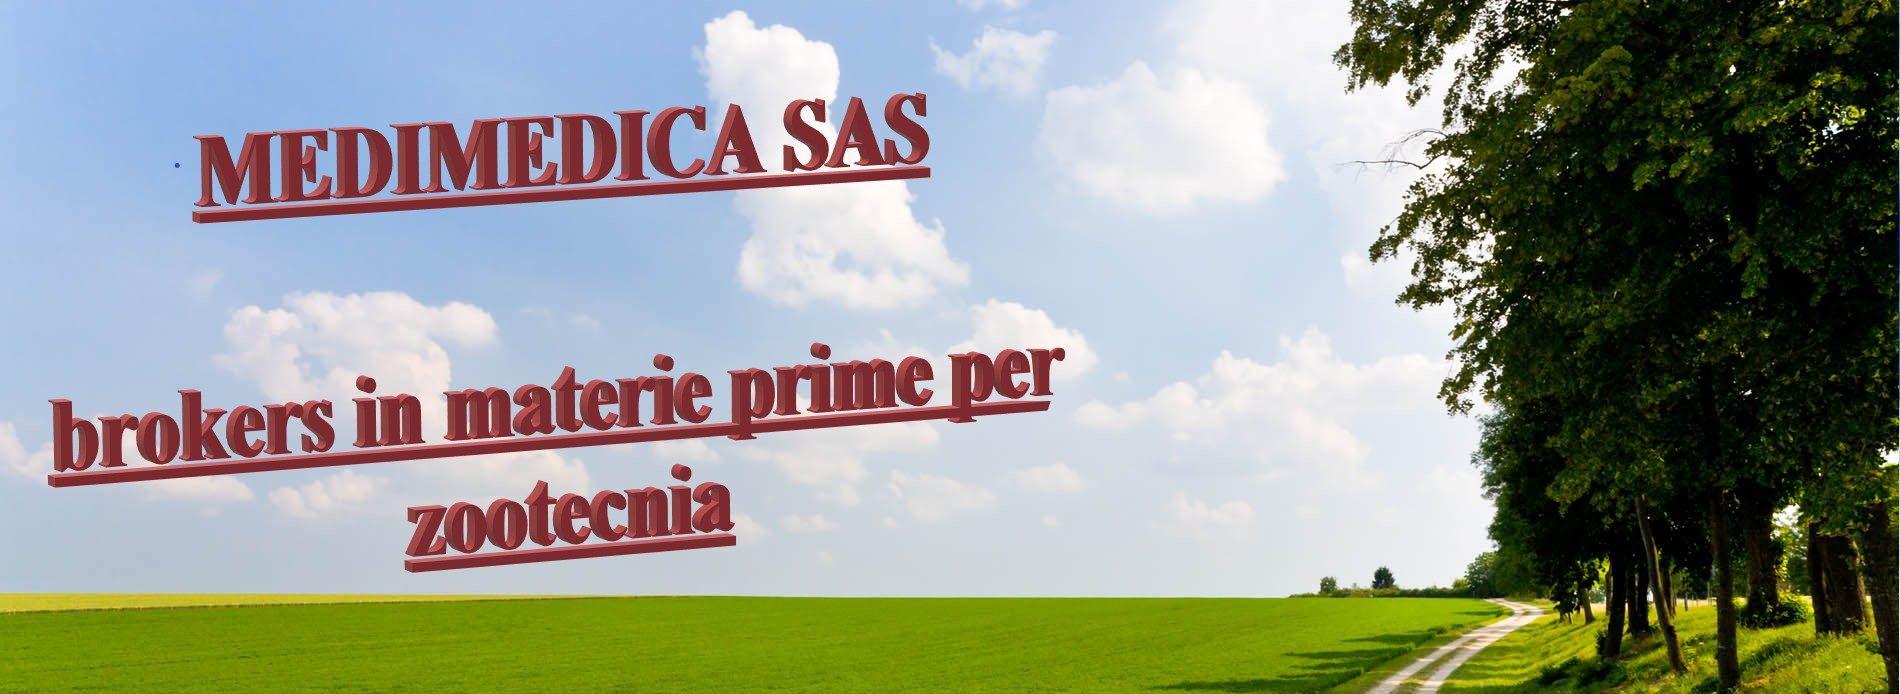 MEDIMEDICA SAS